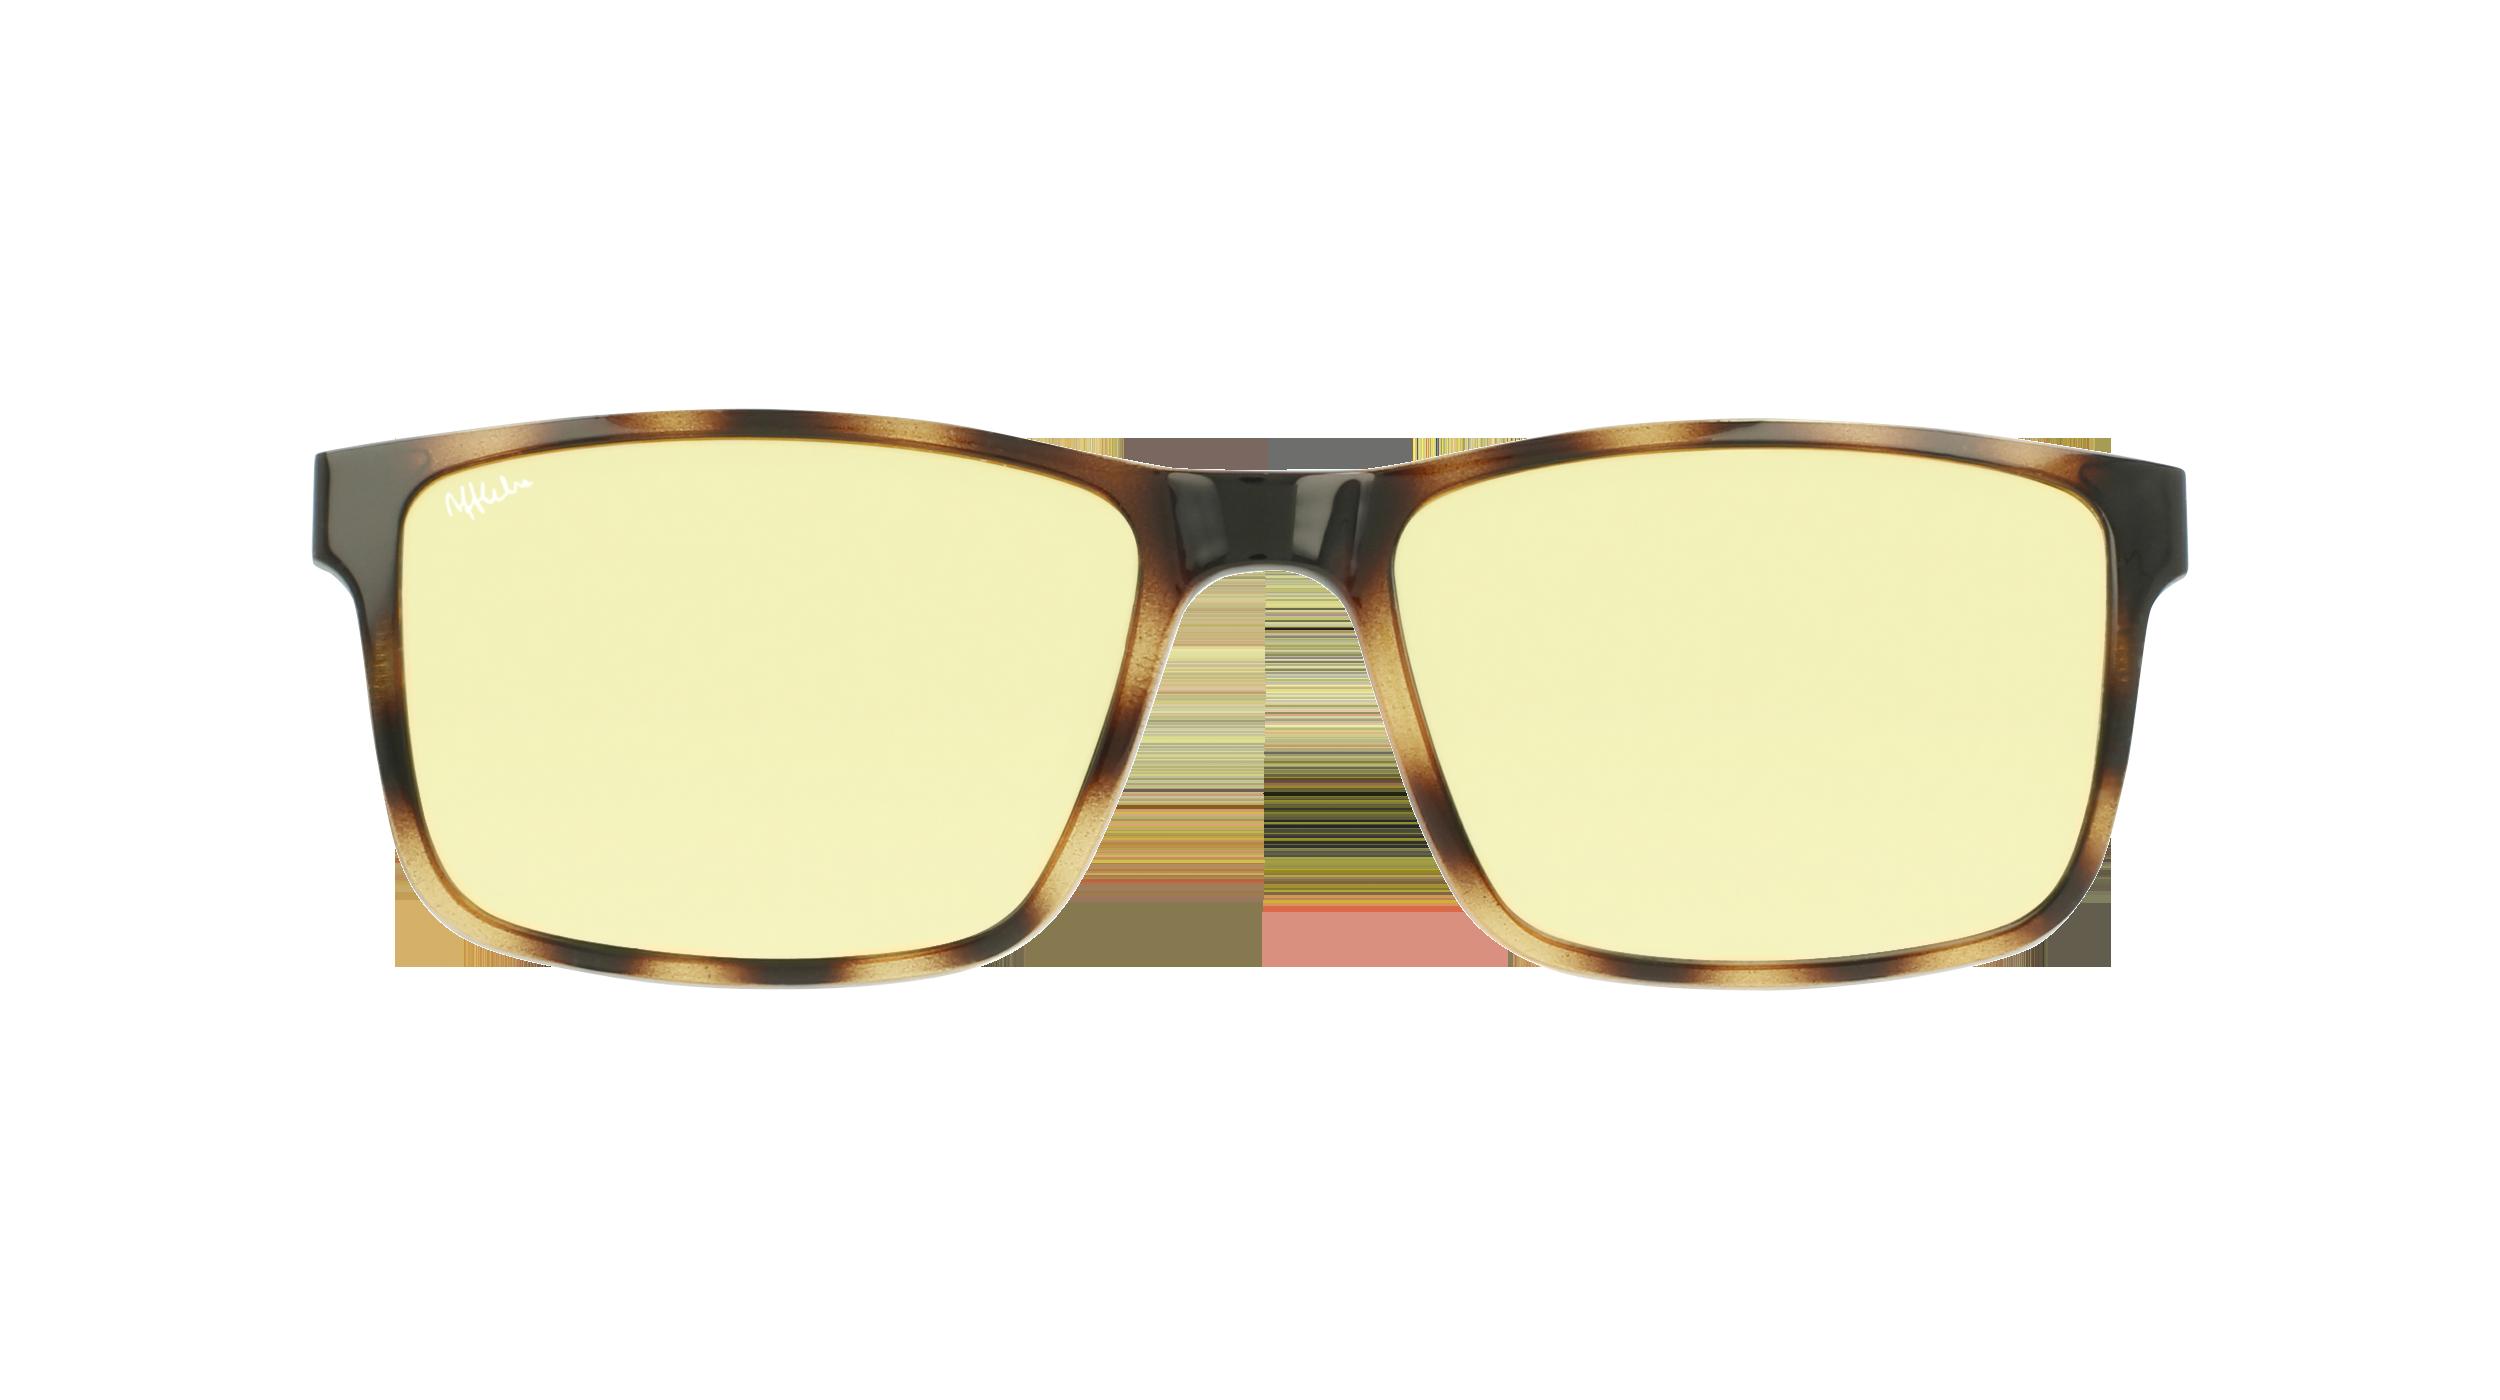 afflelou/france/products/smart_clip/clips_glasses/07630036457498.png